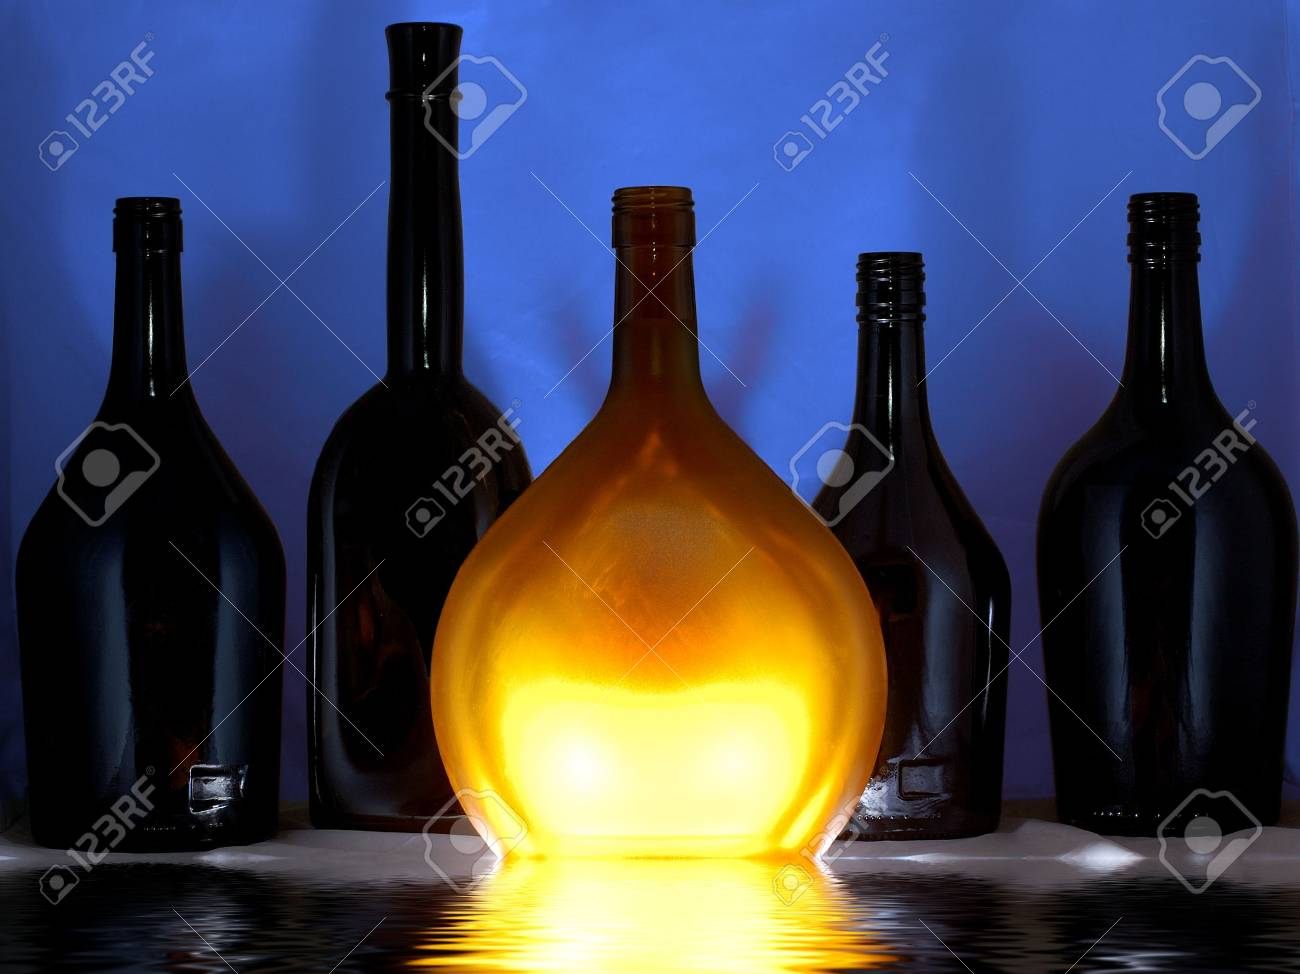 Secrets of cellar dark bottles Stock Photo - 2513955